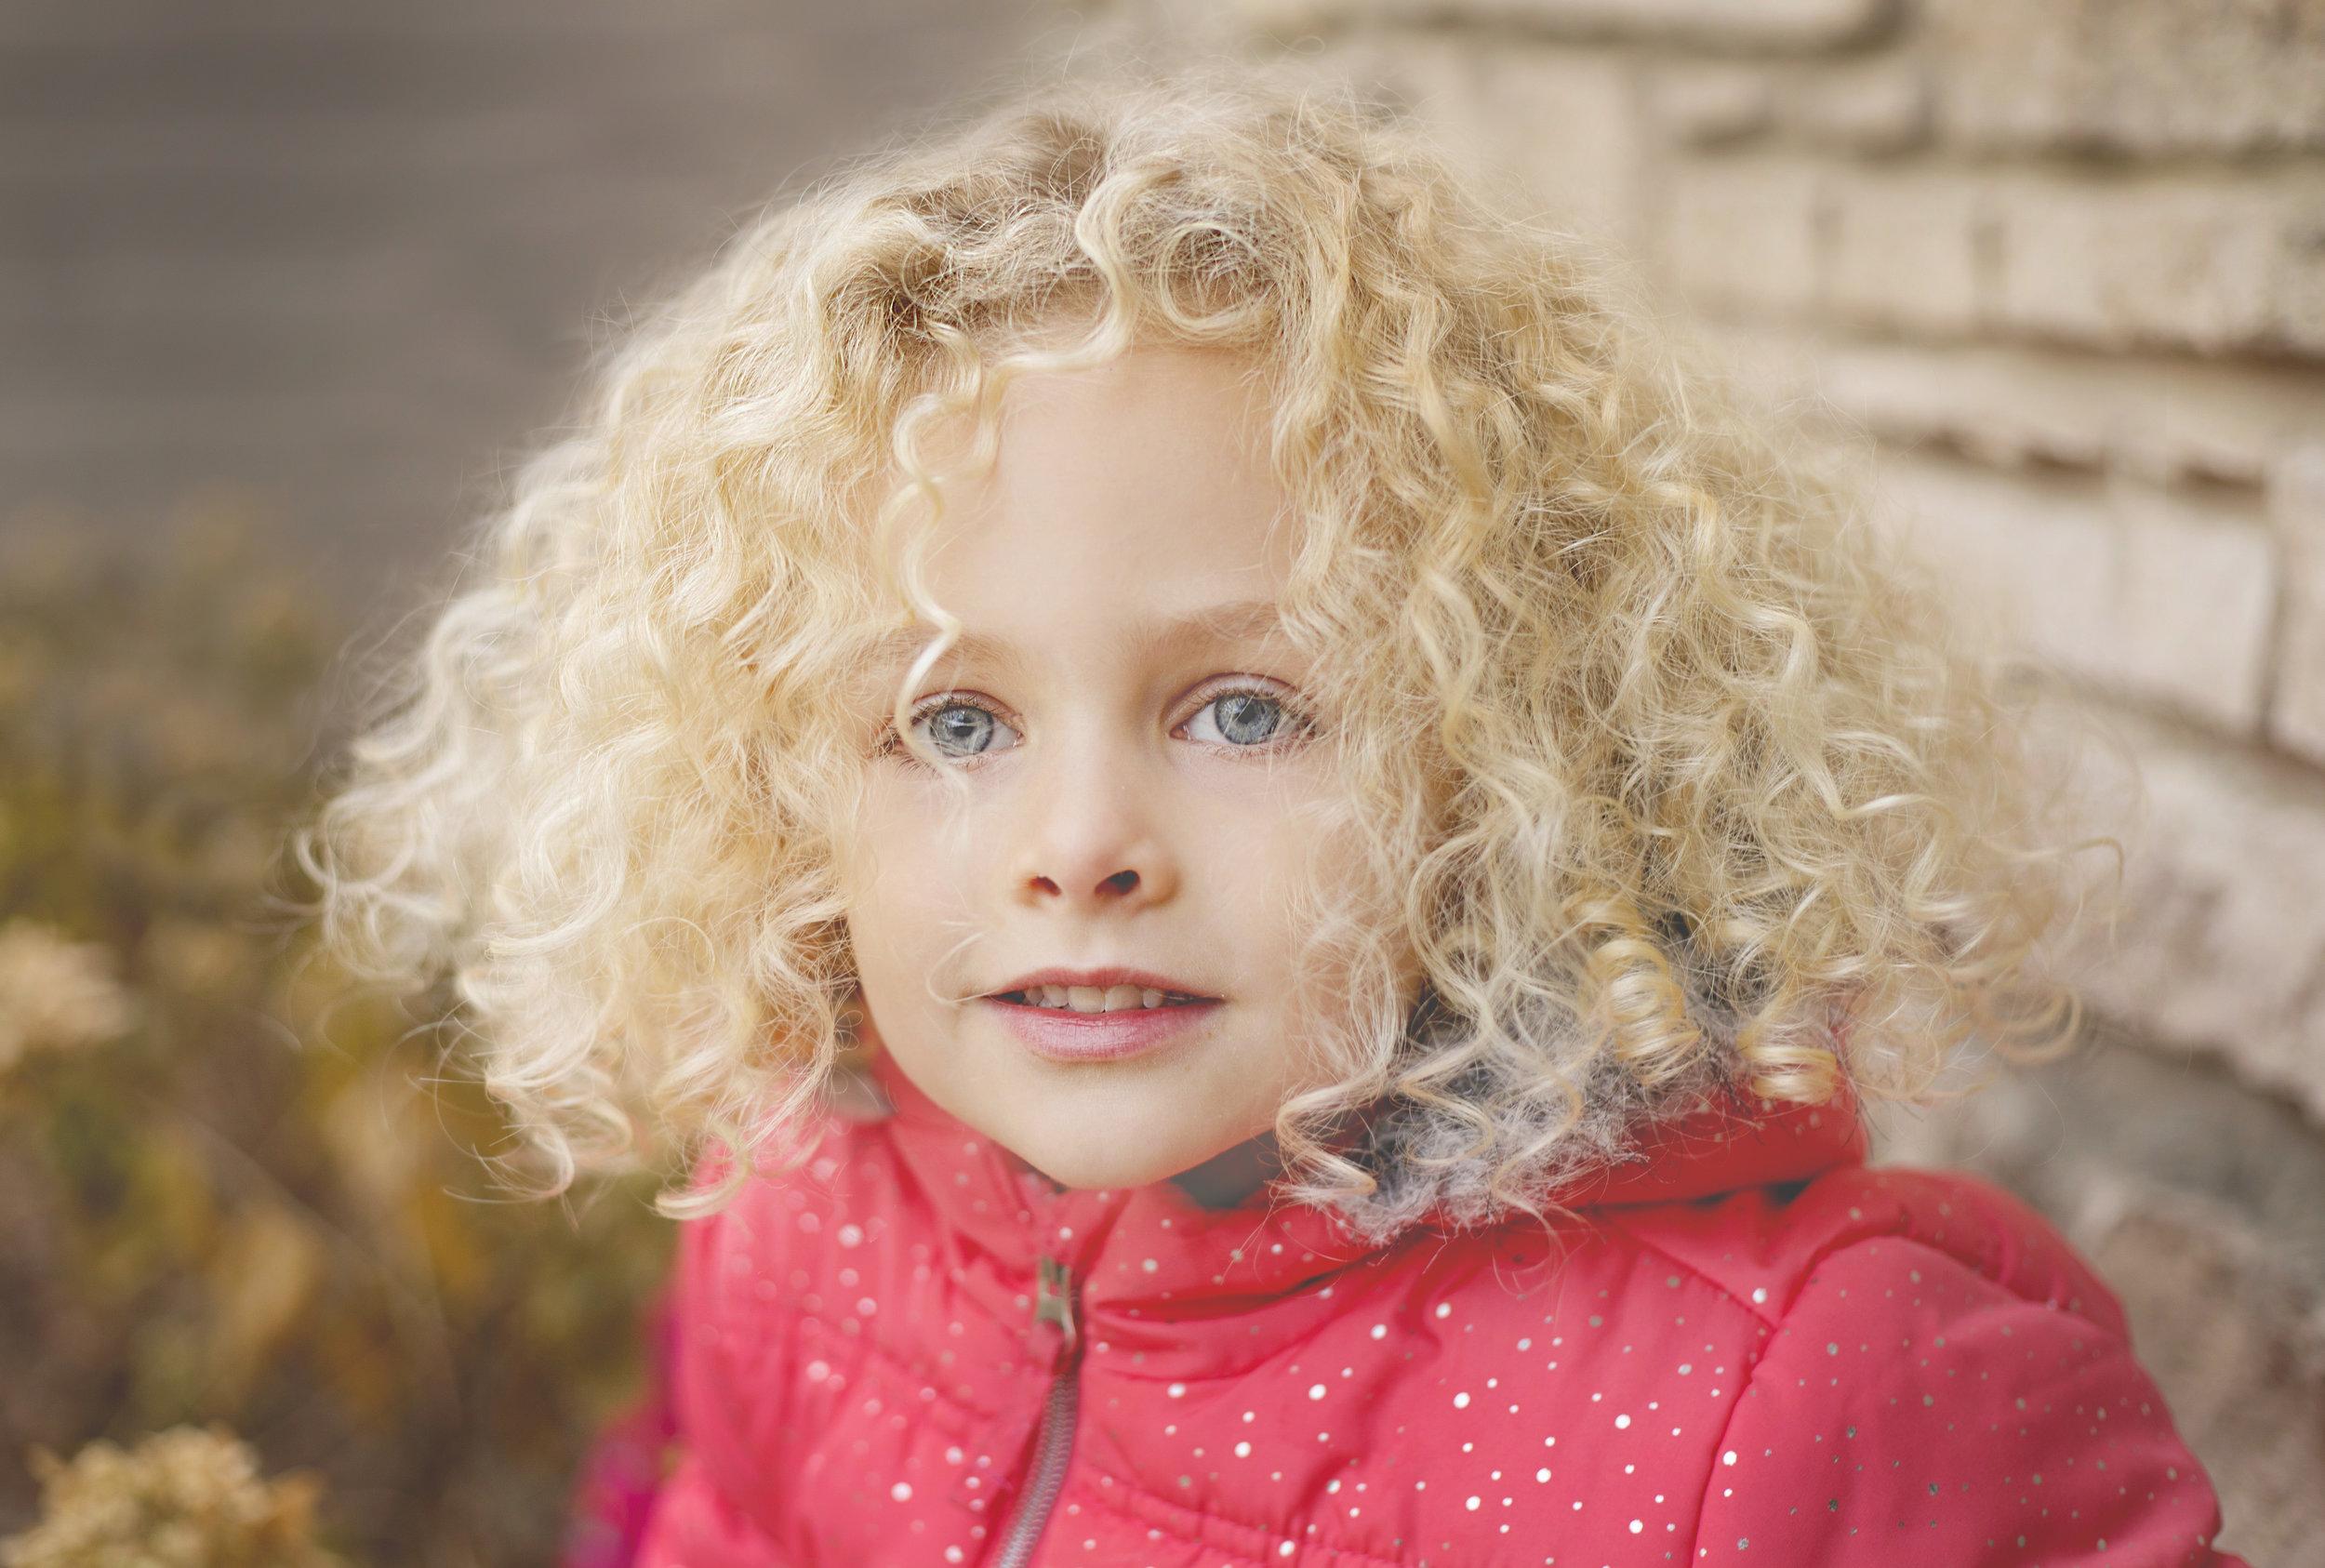 Copy of Children's Photographer